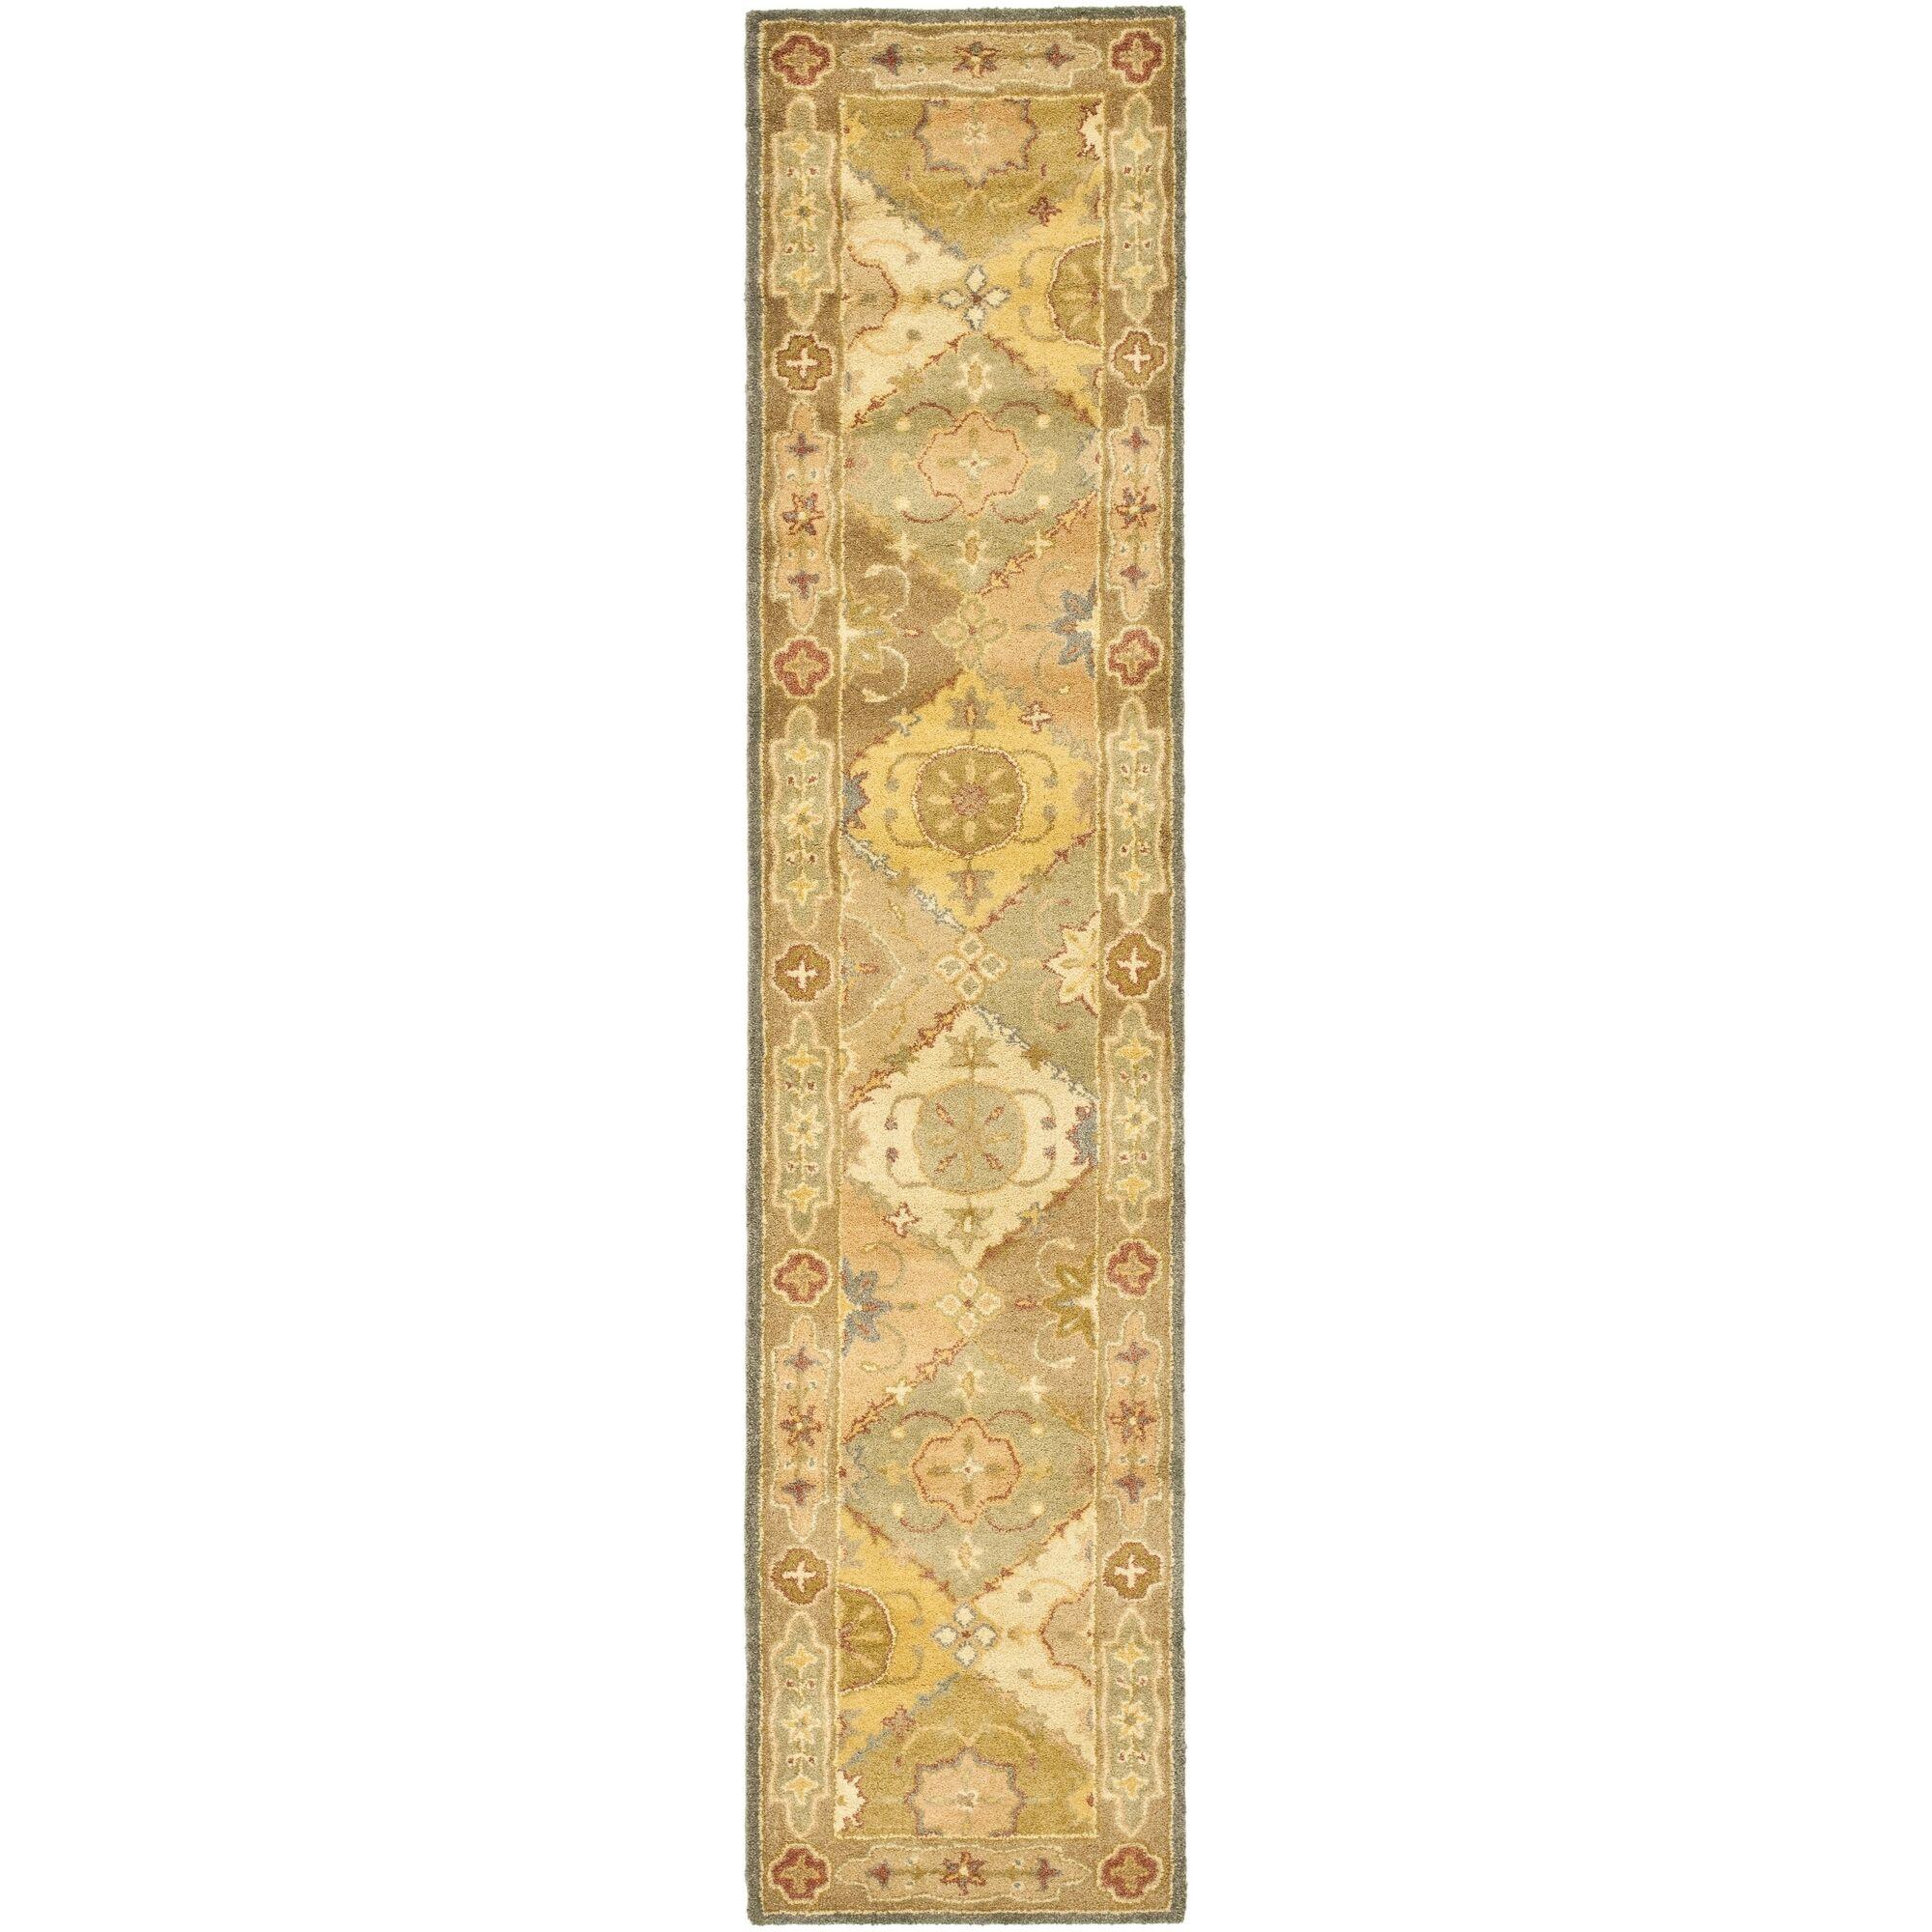 Dunbar Hand-Woven Wool Green/Beige Area Rug Rug Size: Runner 2'3